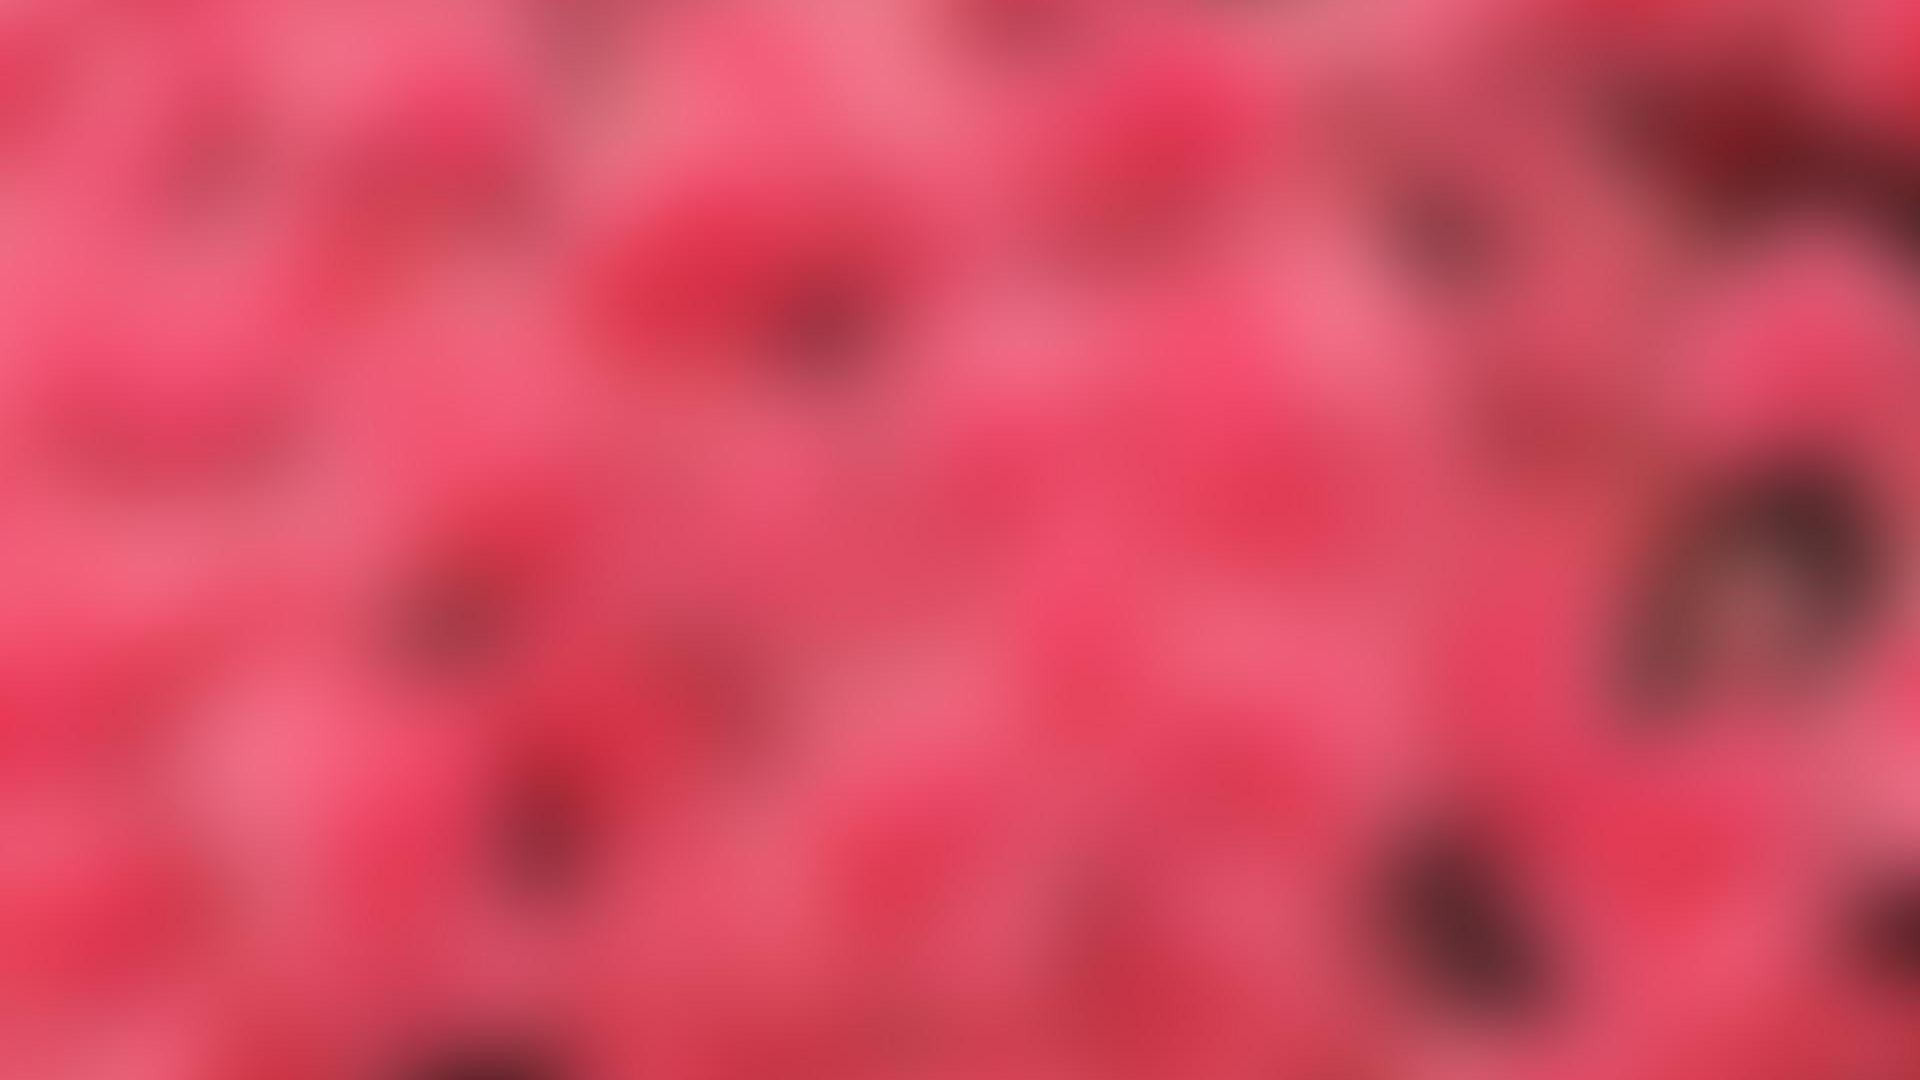 Pink Background Desktop Full HD desktop wallpaper Wallinda 1920x1080